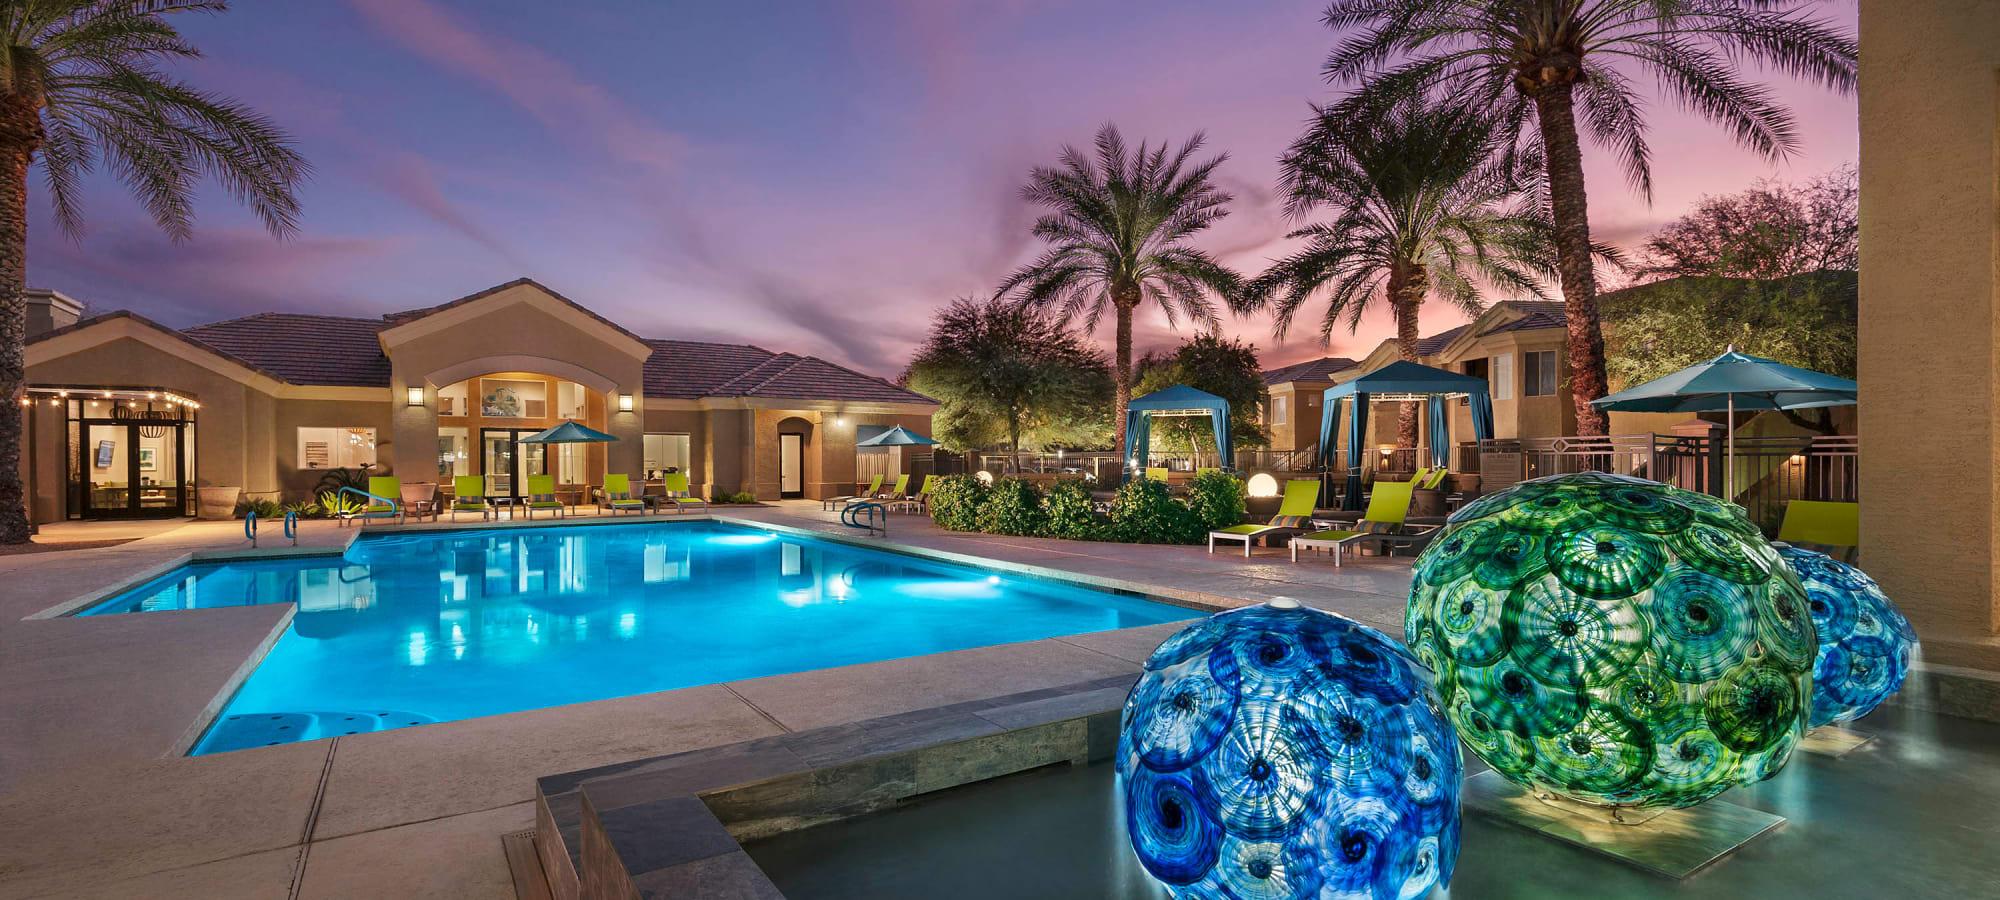 Illuminated decor near the swimming pool at dusk at Mira Santi in Chandler, Arizona